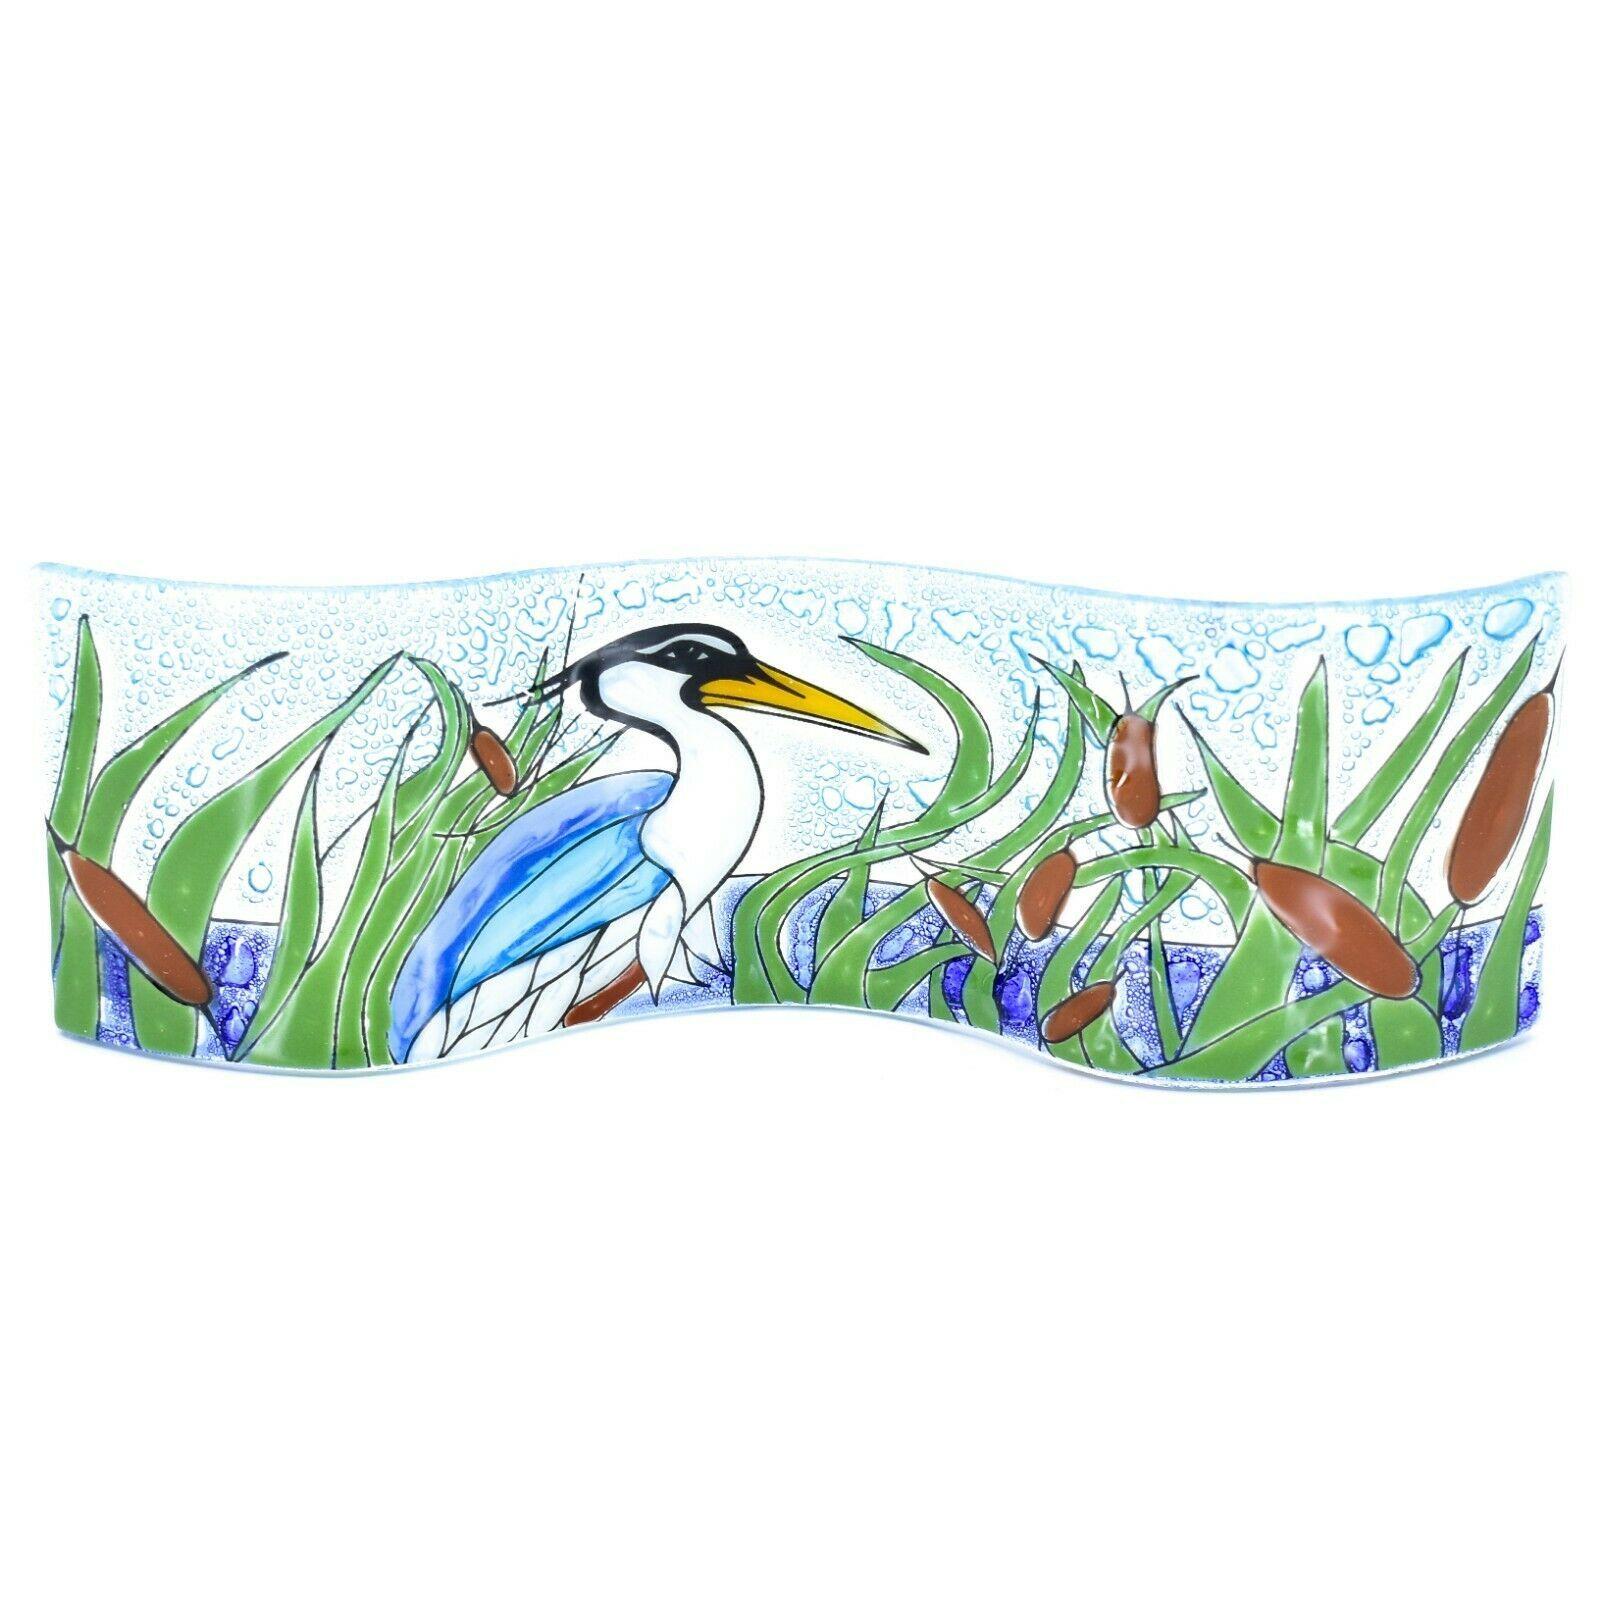 Fused Art Glass Blue Heron Cattails Lake Wavy Decor Piece Handmade in Ecuador